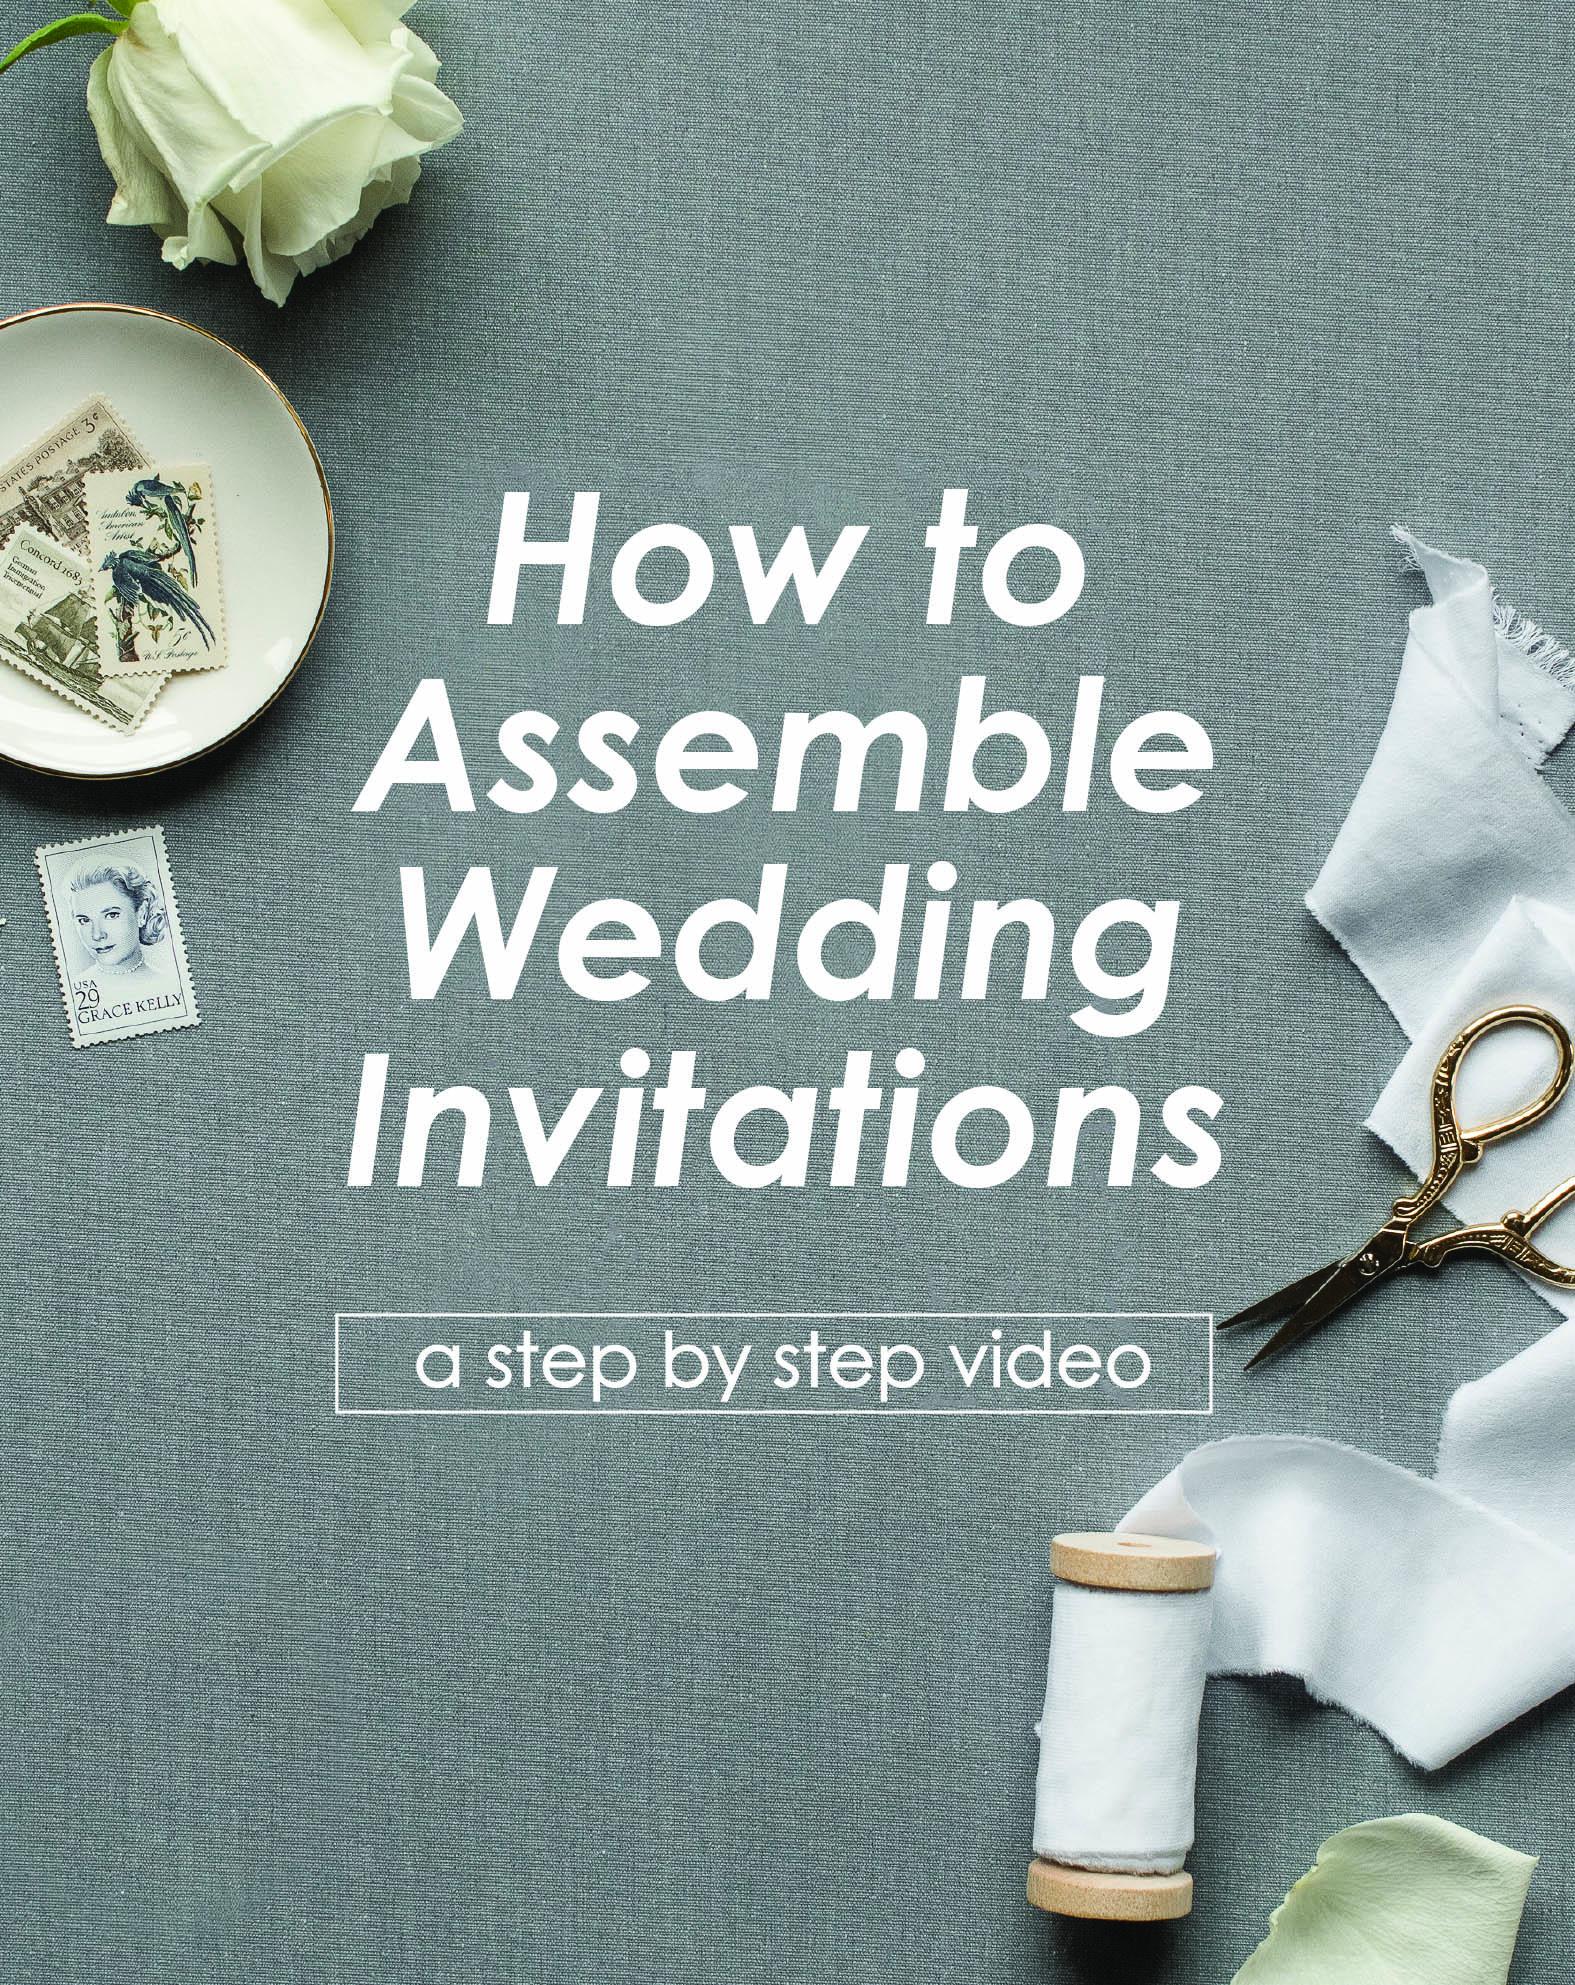 How To Assemble Wedding Invitations Video Tutorial Nine0nine